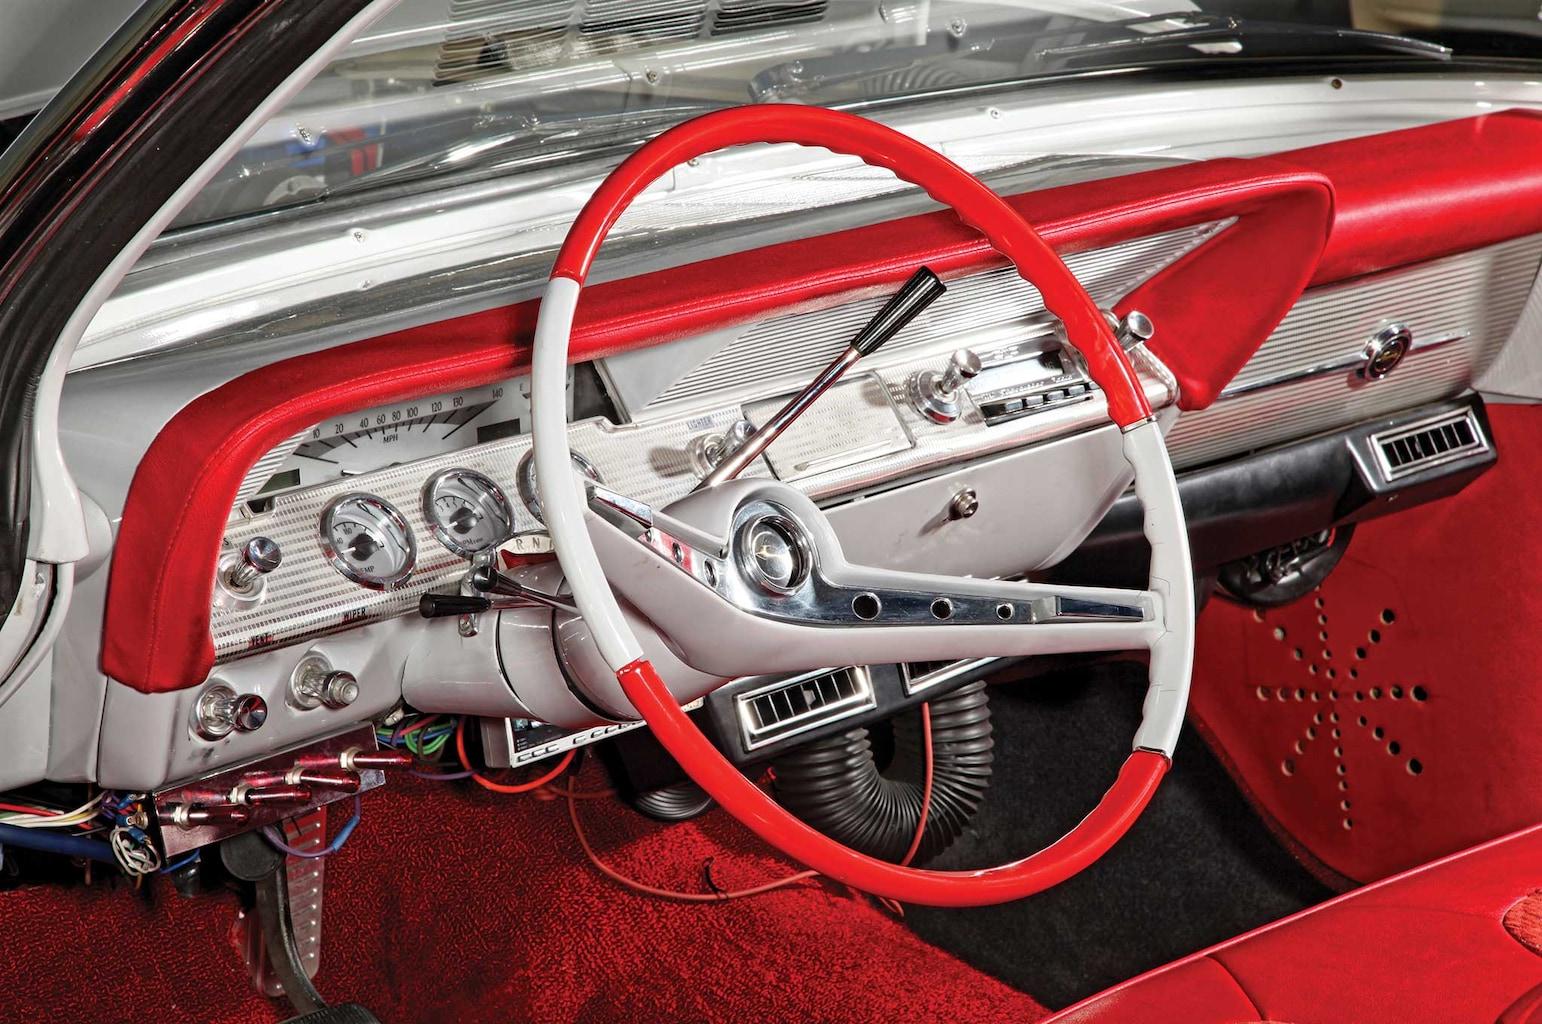 004 1962 chevrolet impala convertible steering wheel